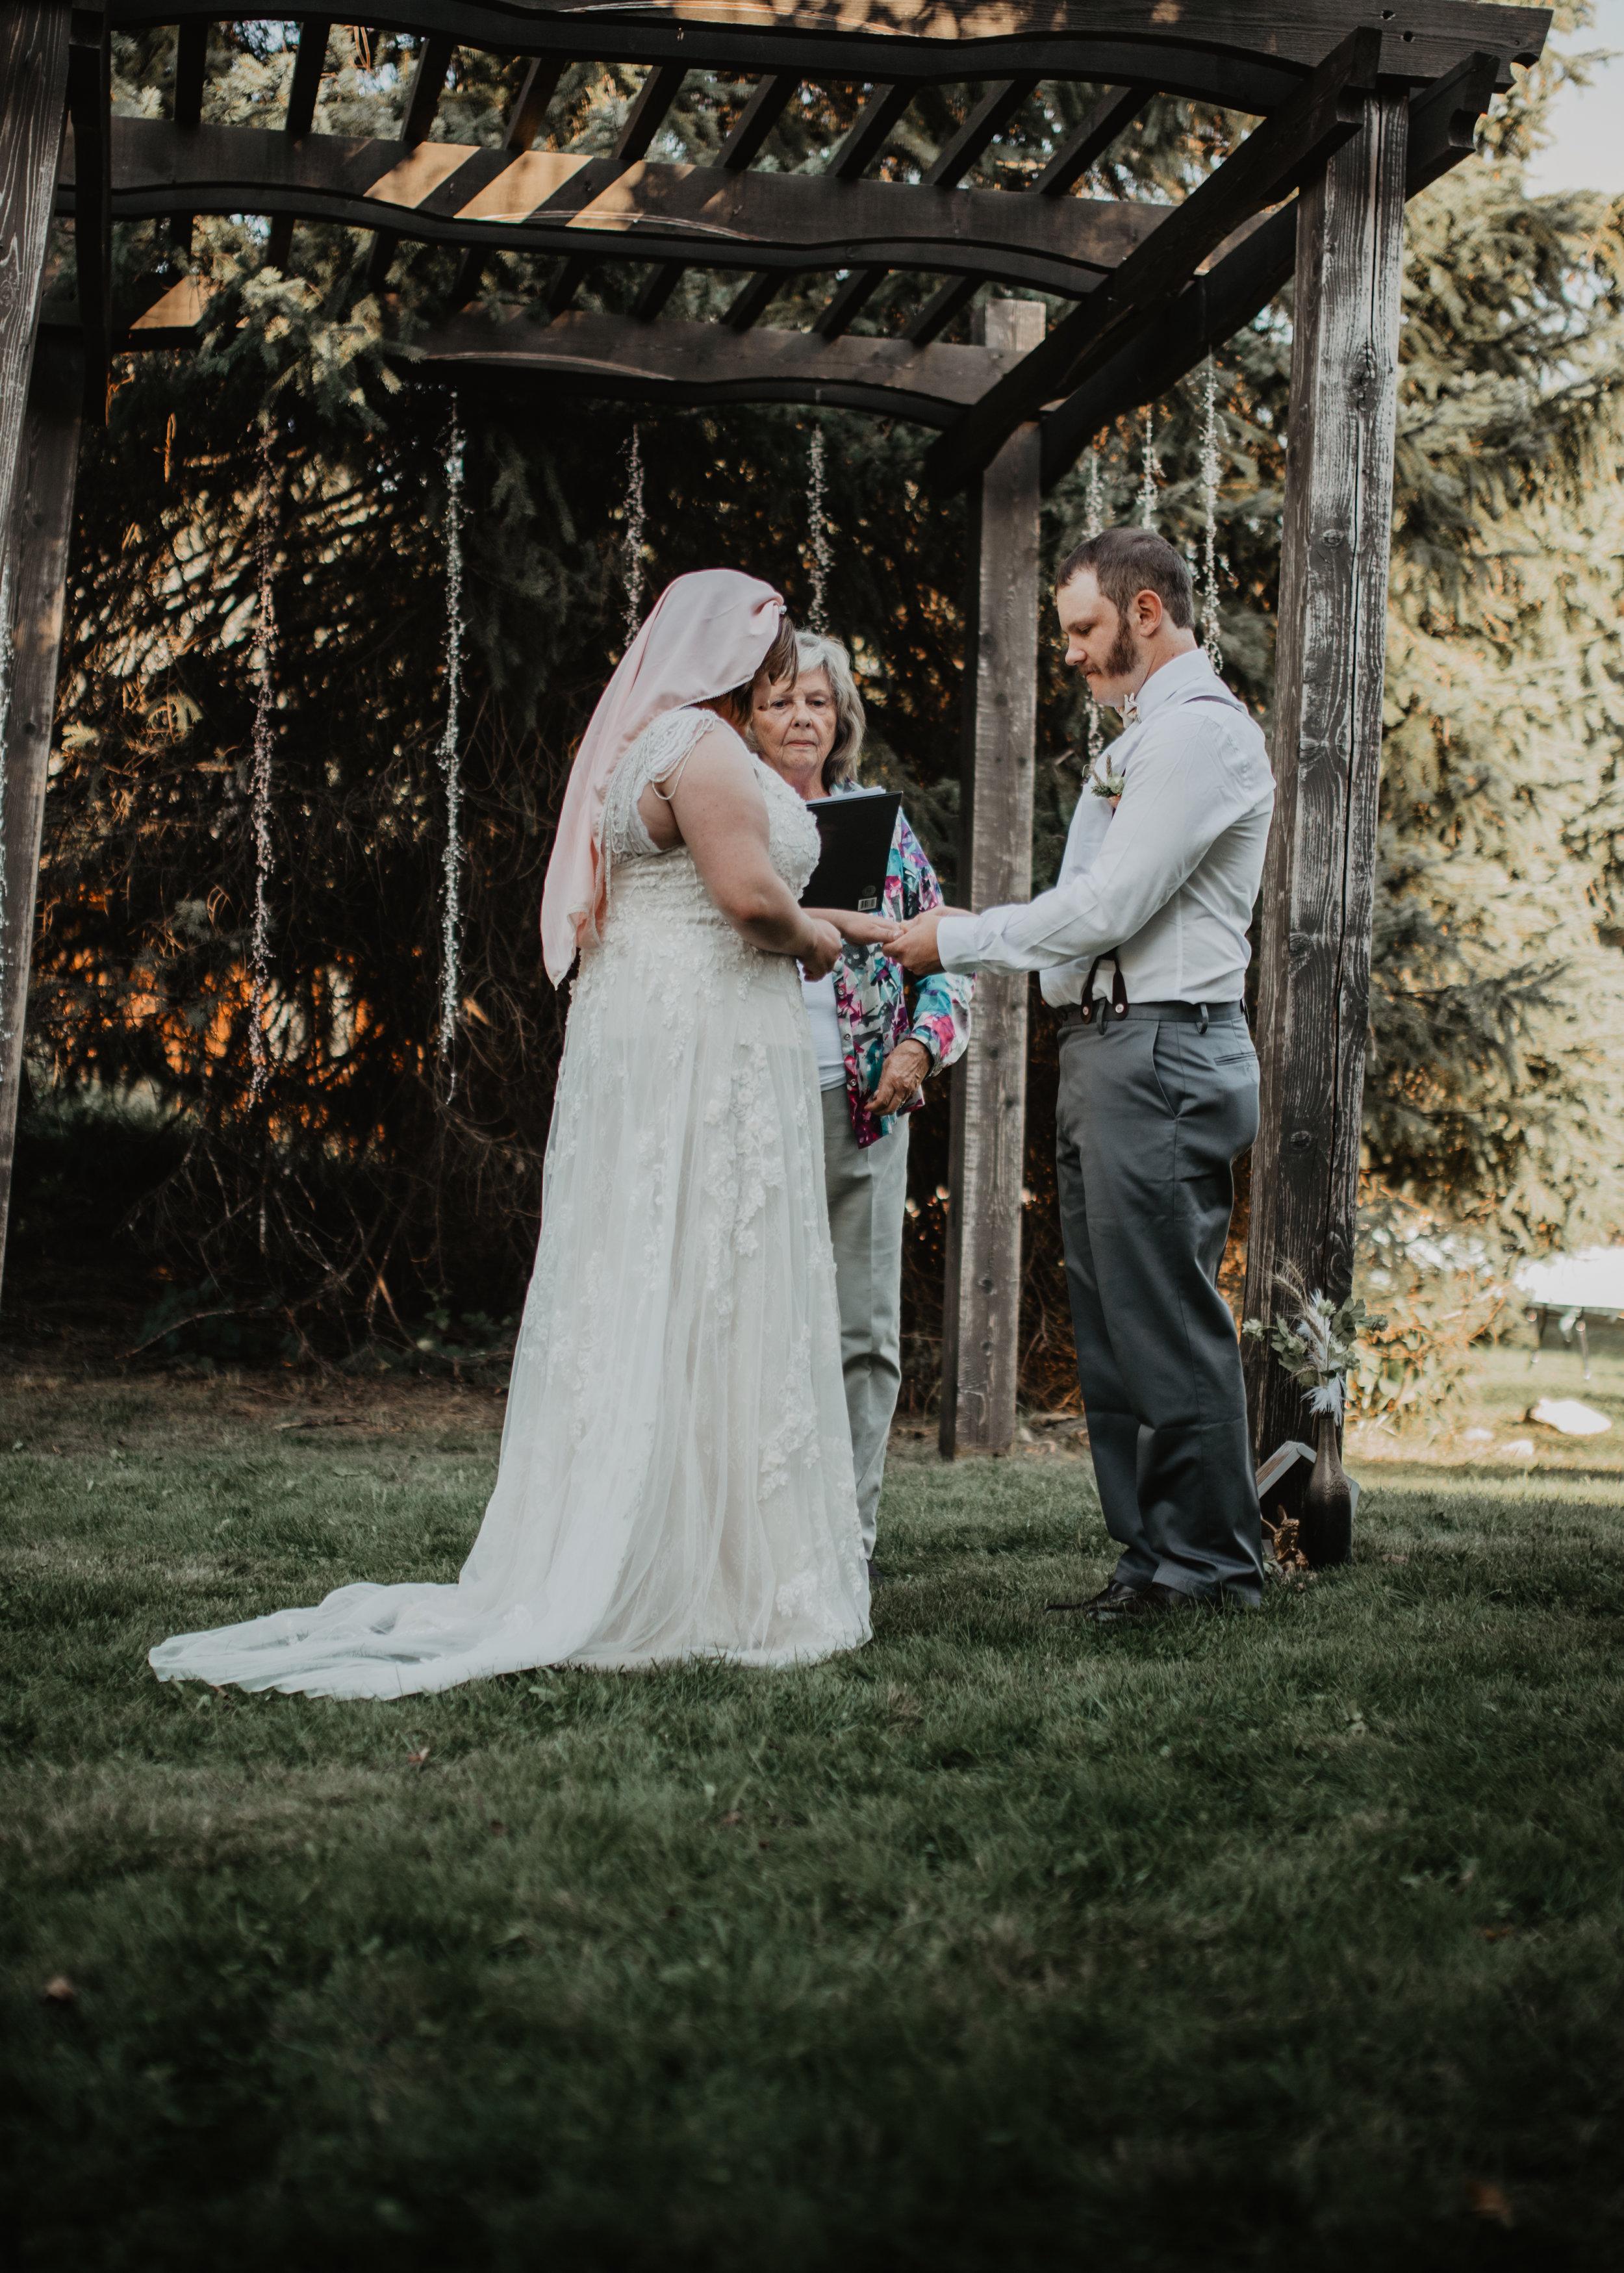 CT Wedding_Ceremony-31.jpg